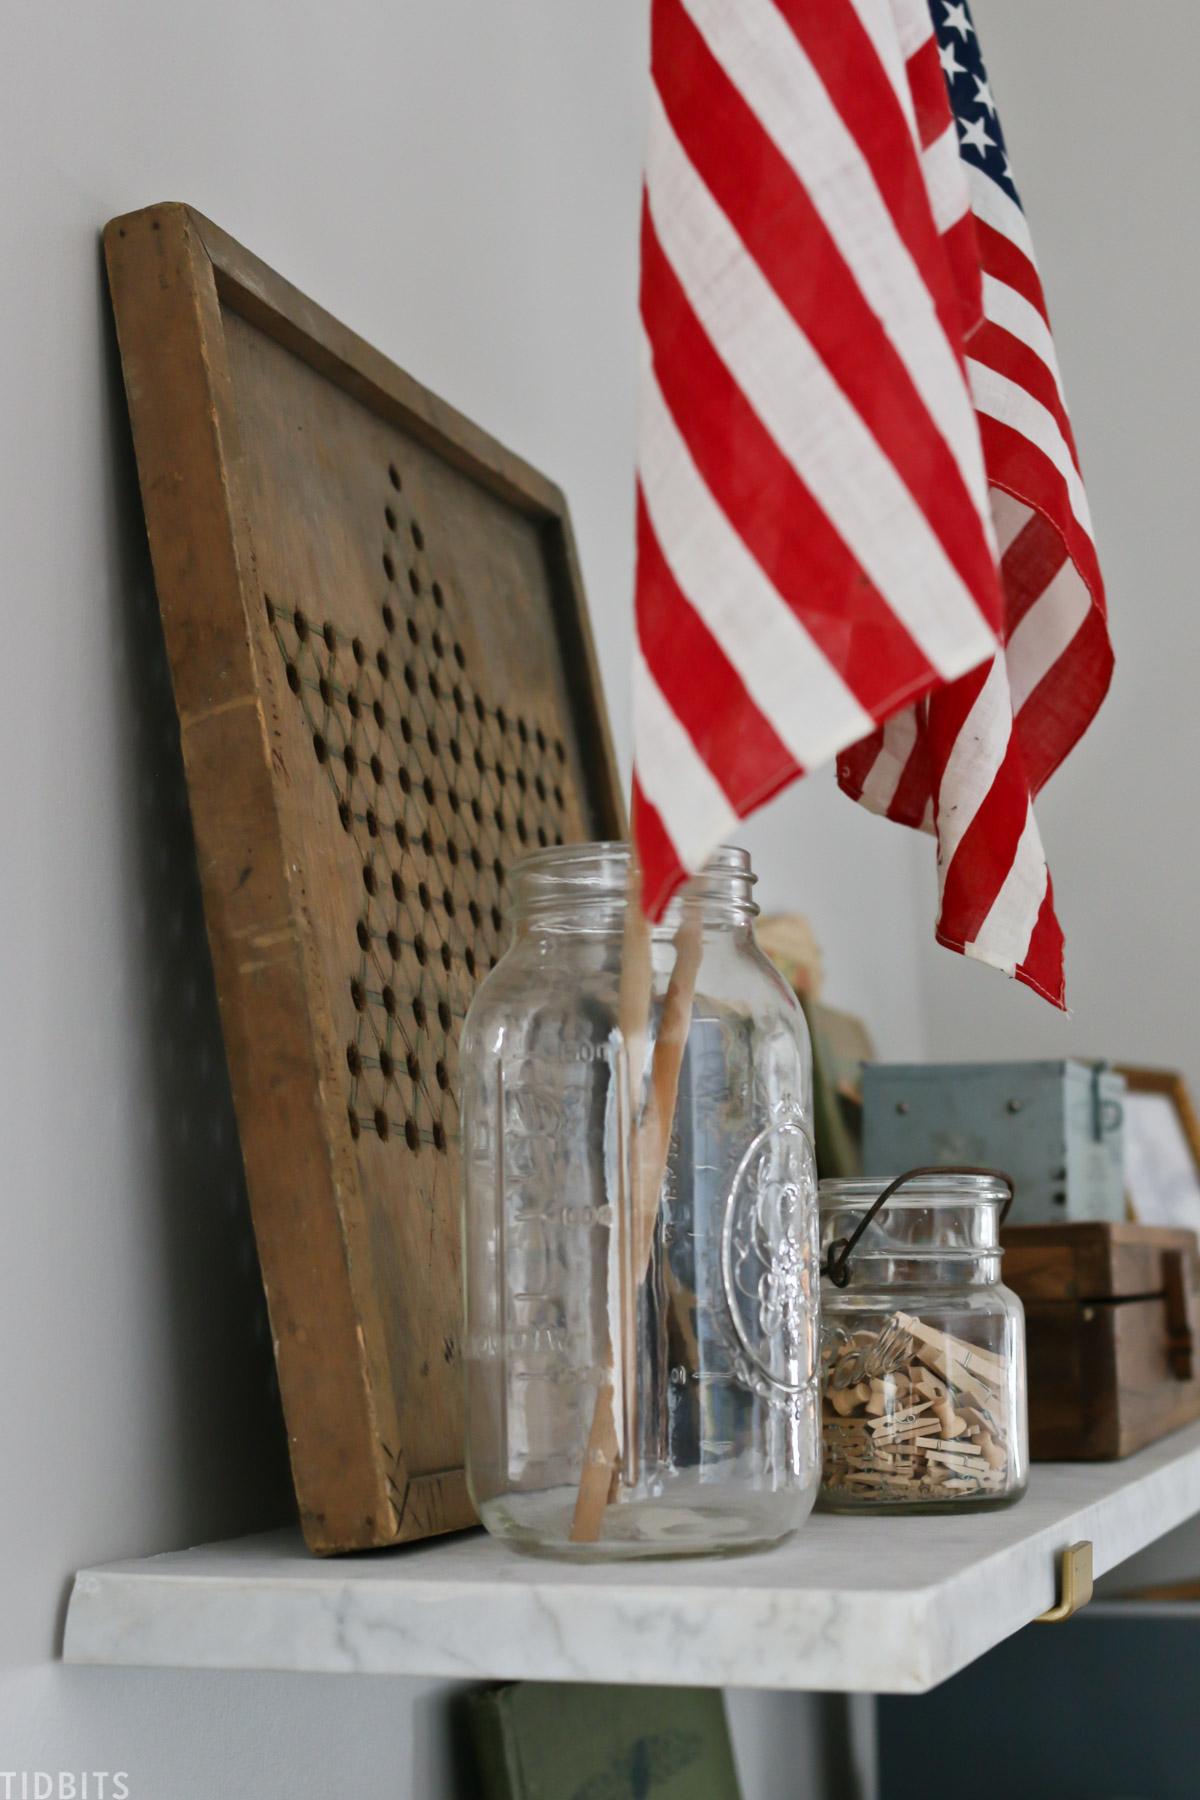 Mason jar holding a United States flag. The mason jar is on a floating shelf.